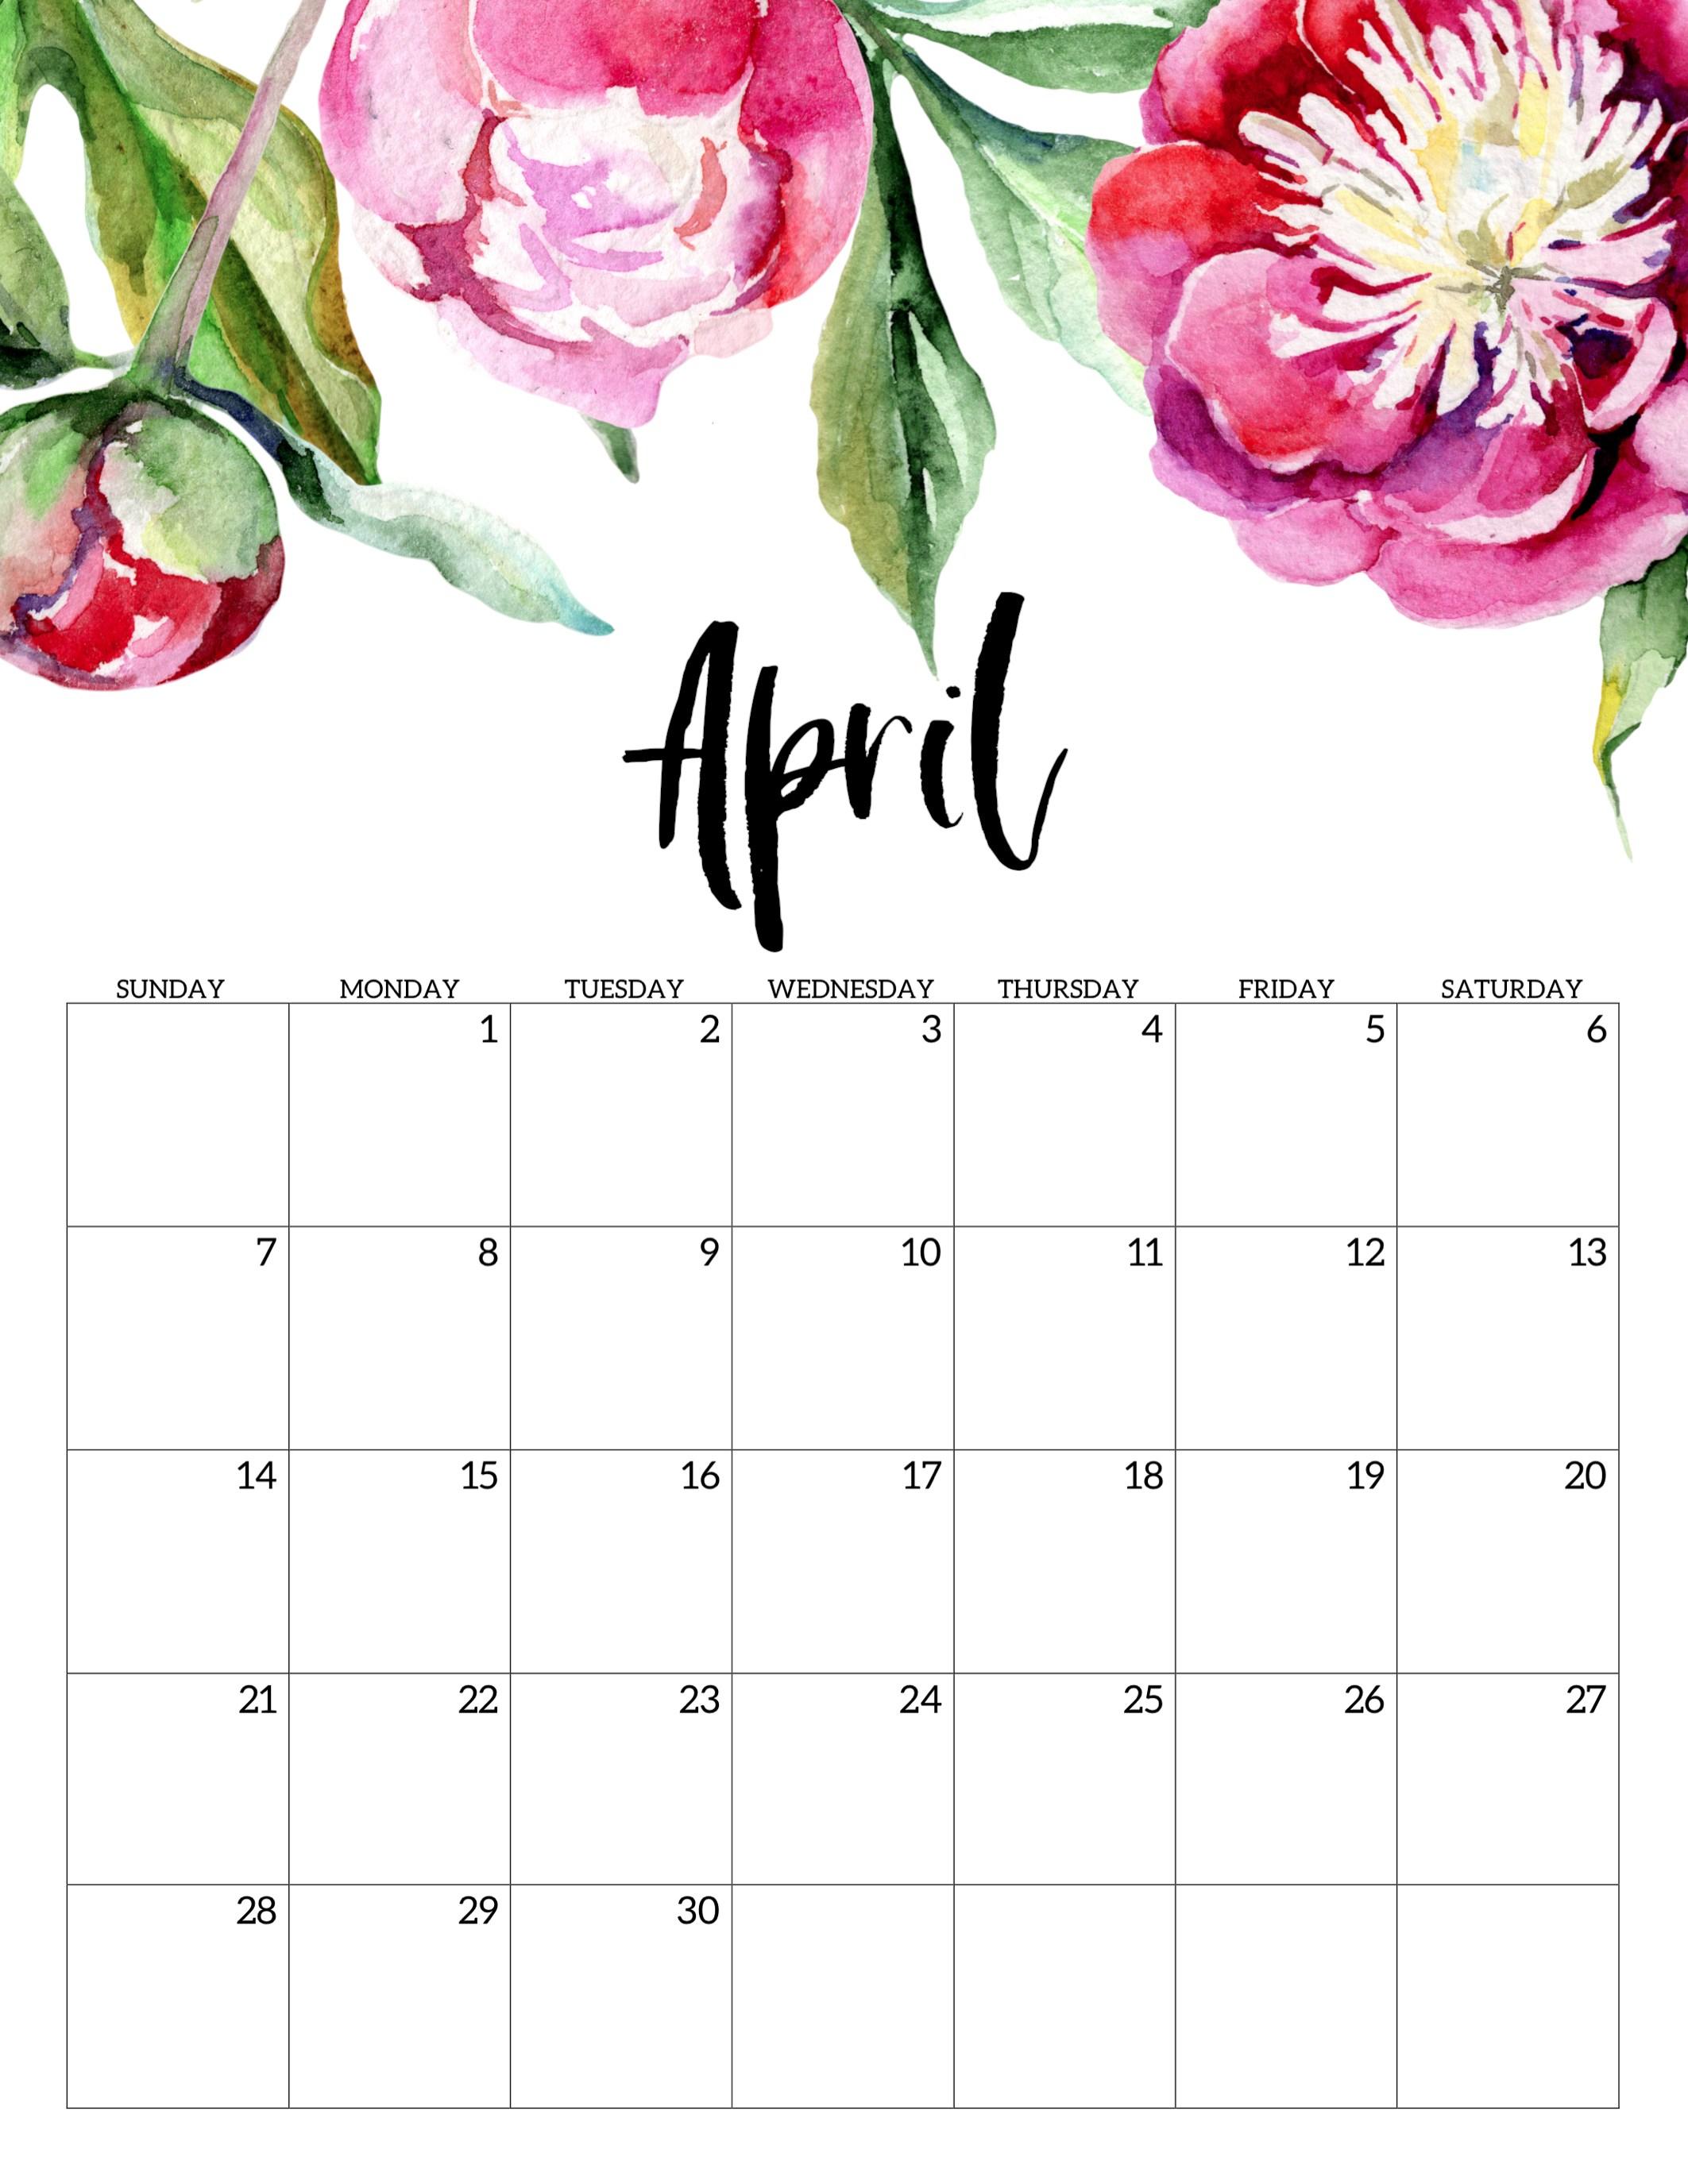 Free Printable Calendar 2019 - Floral - Paper Trail Design pertaining to Decorative Printable Calendar Templates